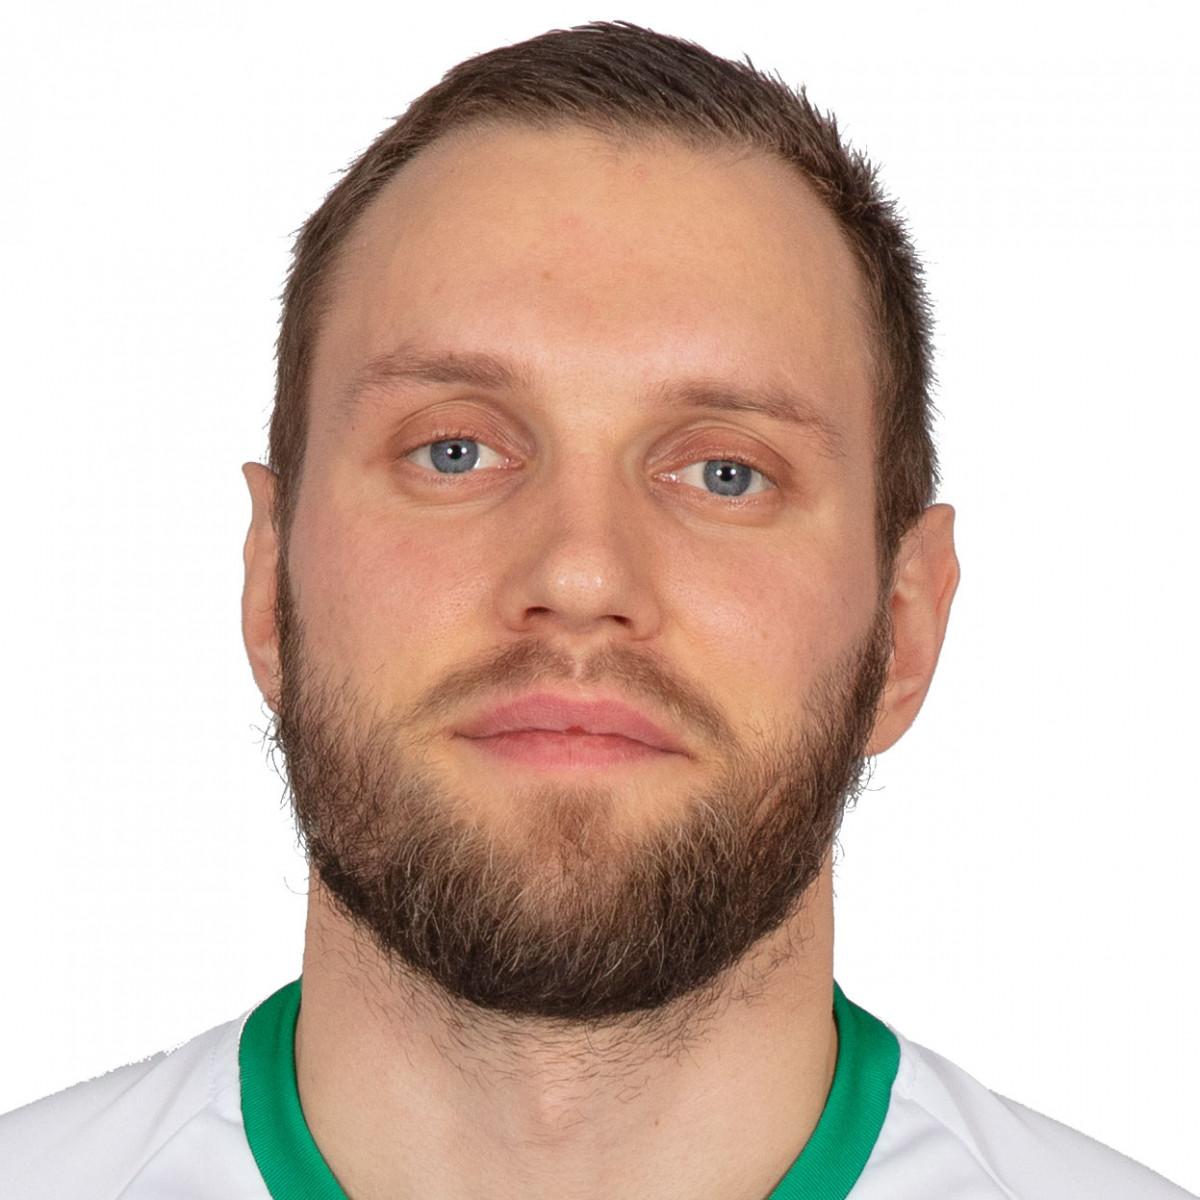 Ovidijus Varanauskas